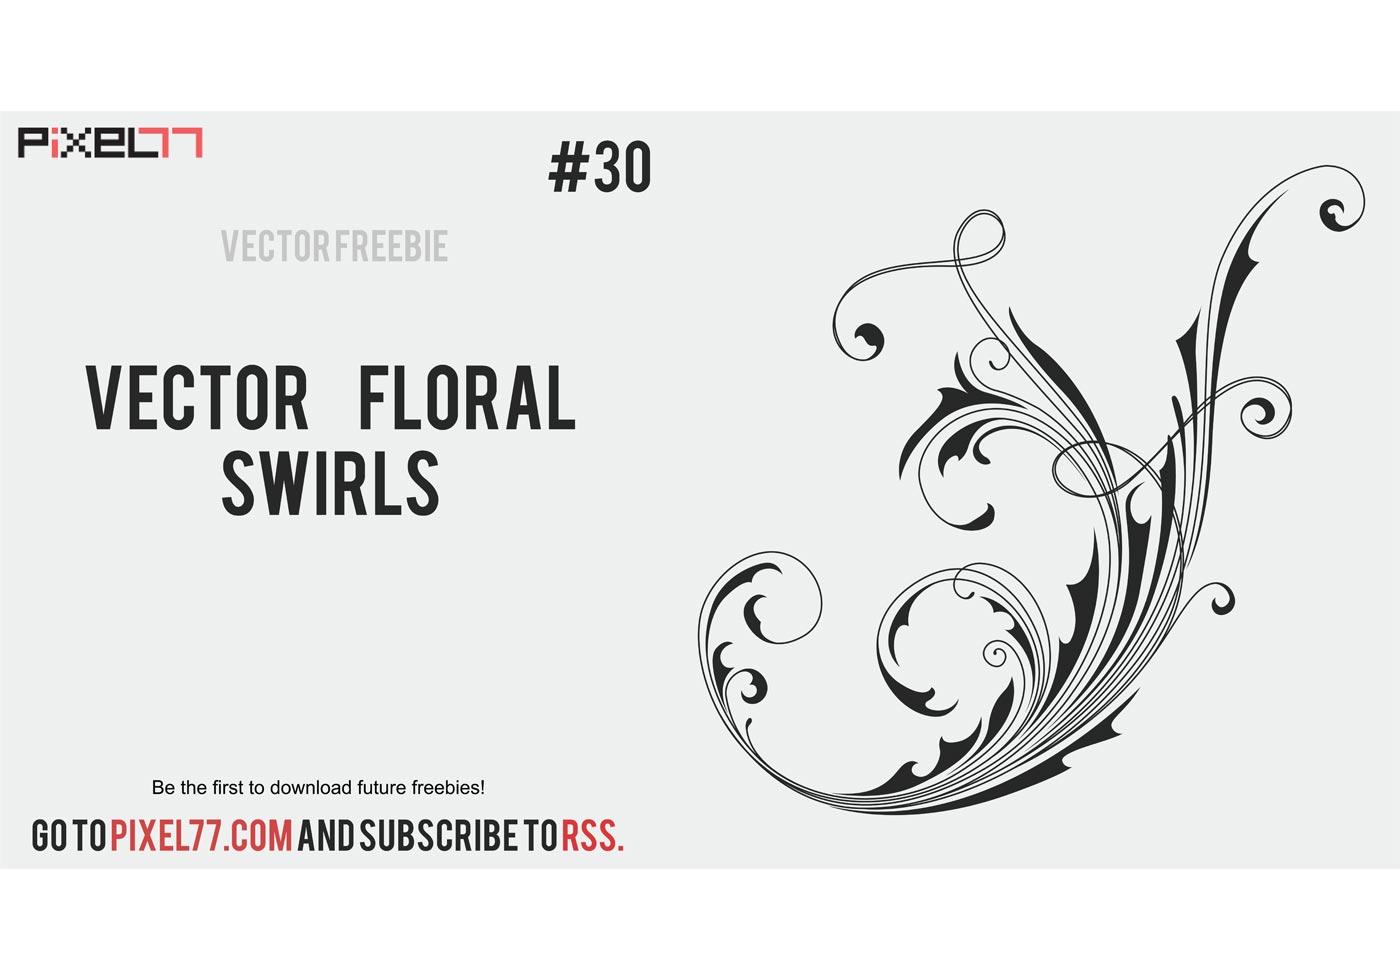 Free vector floral swirls